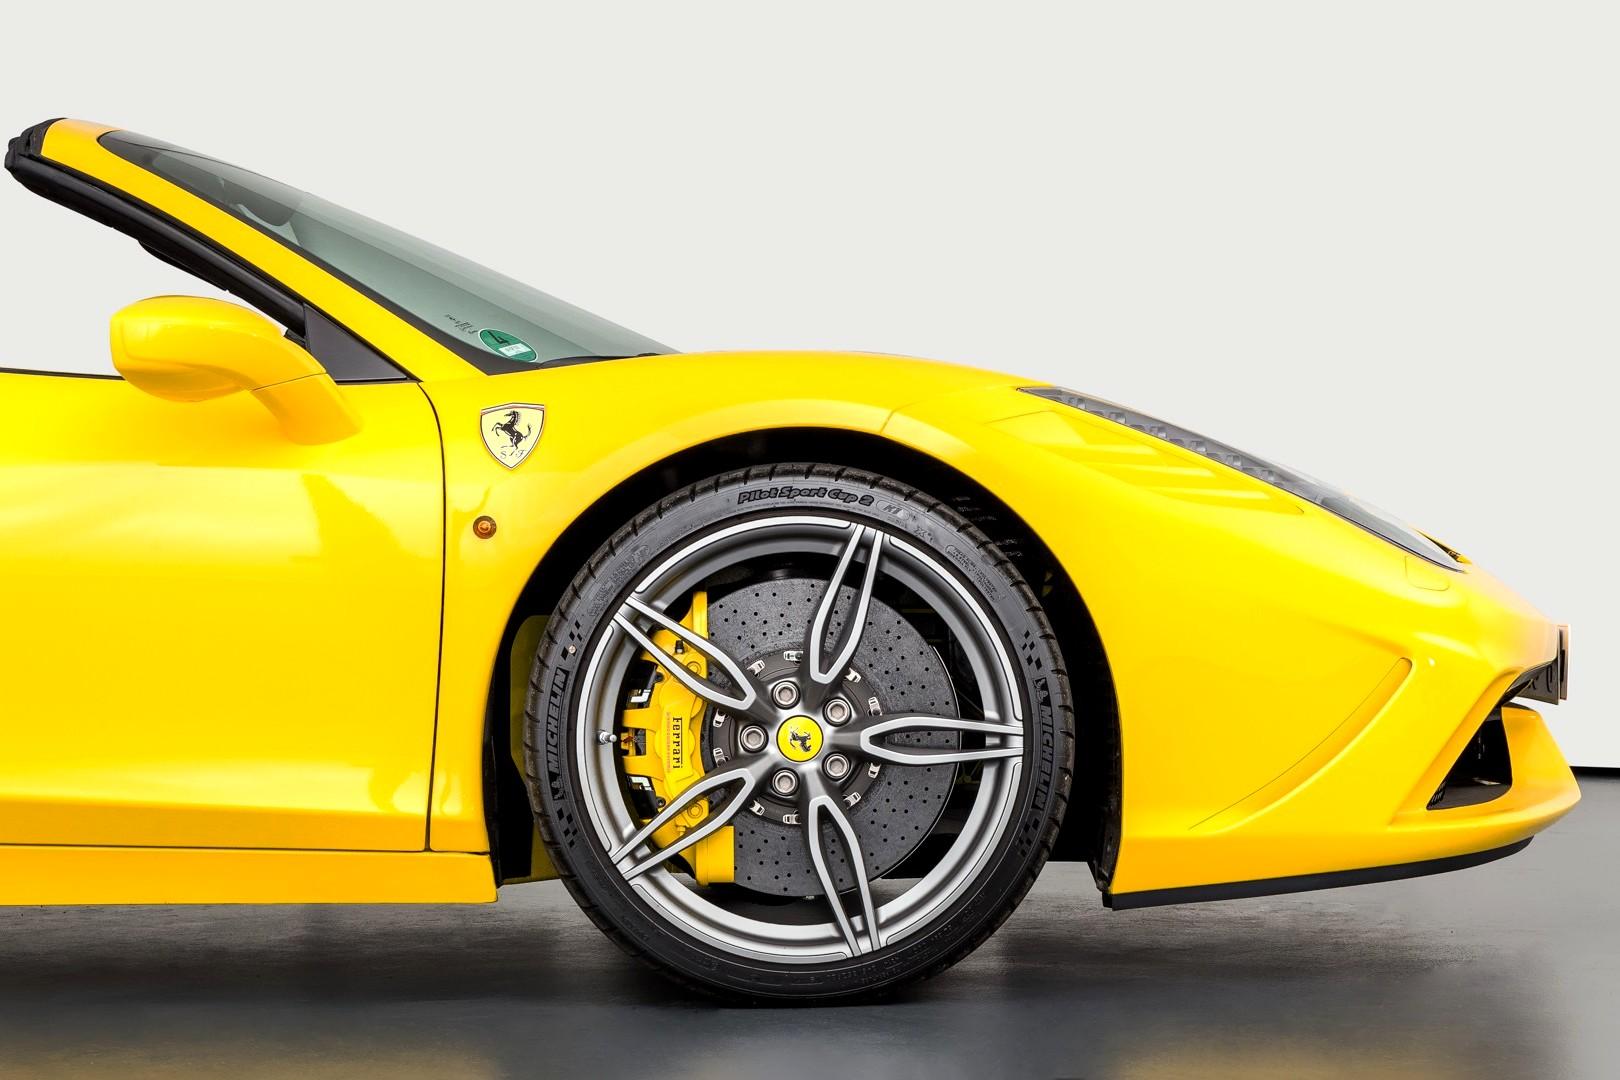 Best exotic cars transport: 2015 Ferrari 458 Speciale Aperta, Pleidelsheim, Germany, approx. $644,188.